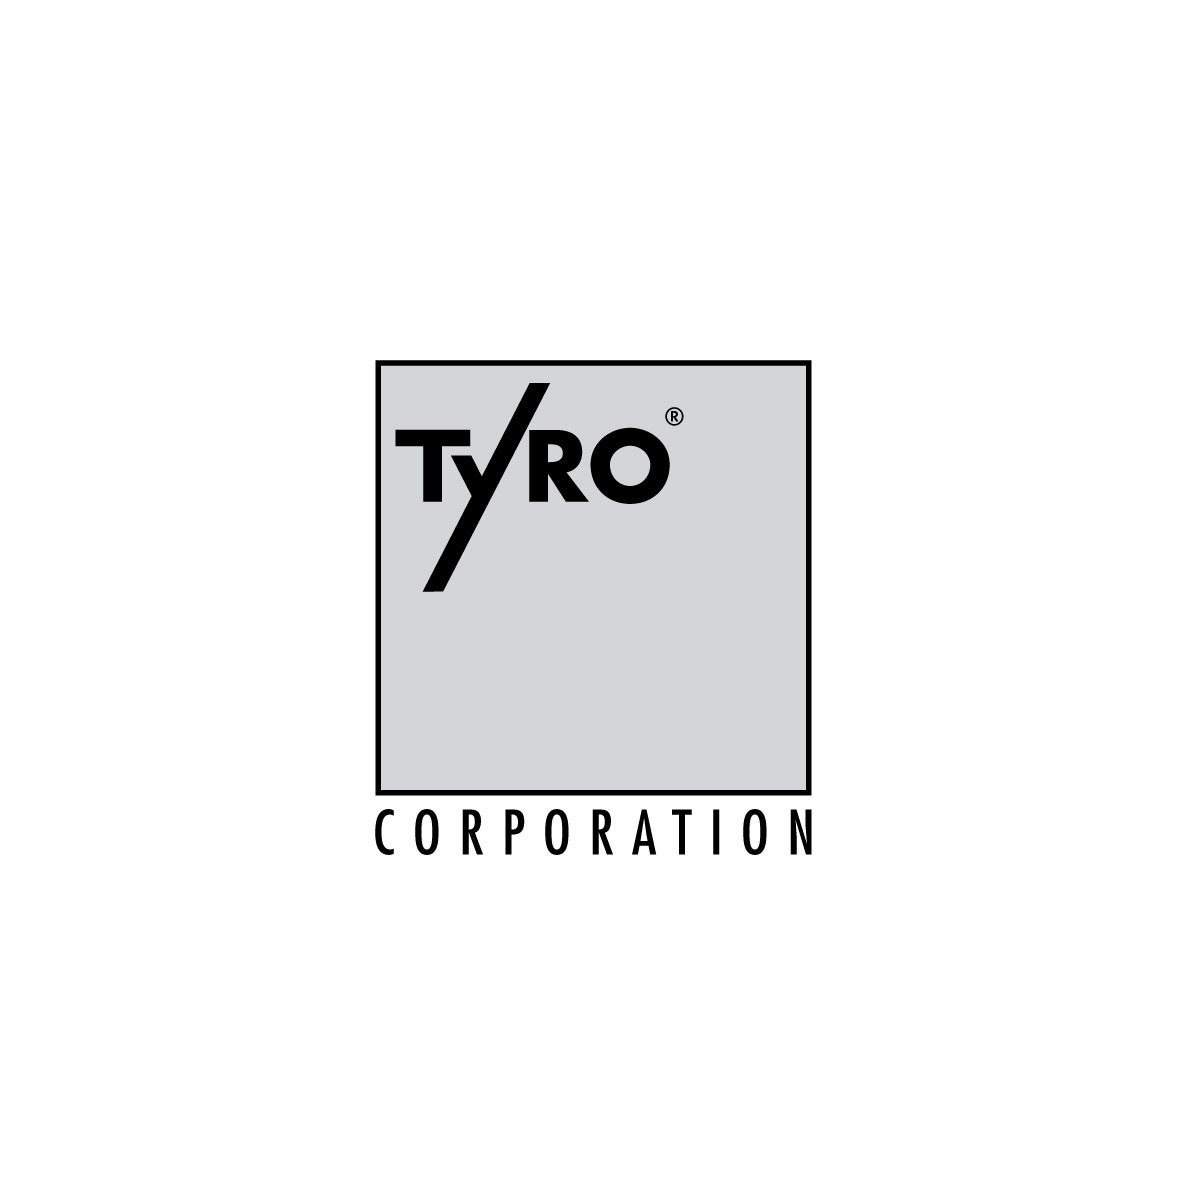 Tyro Corporation